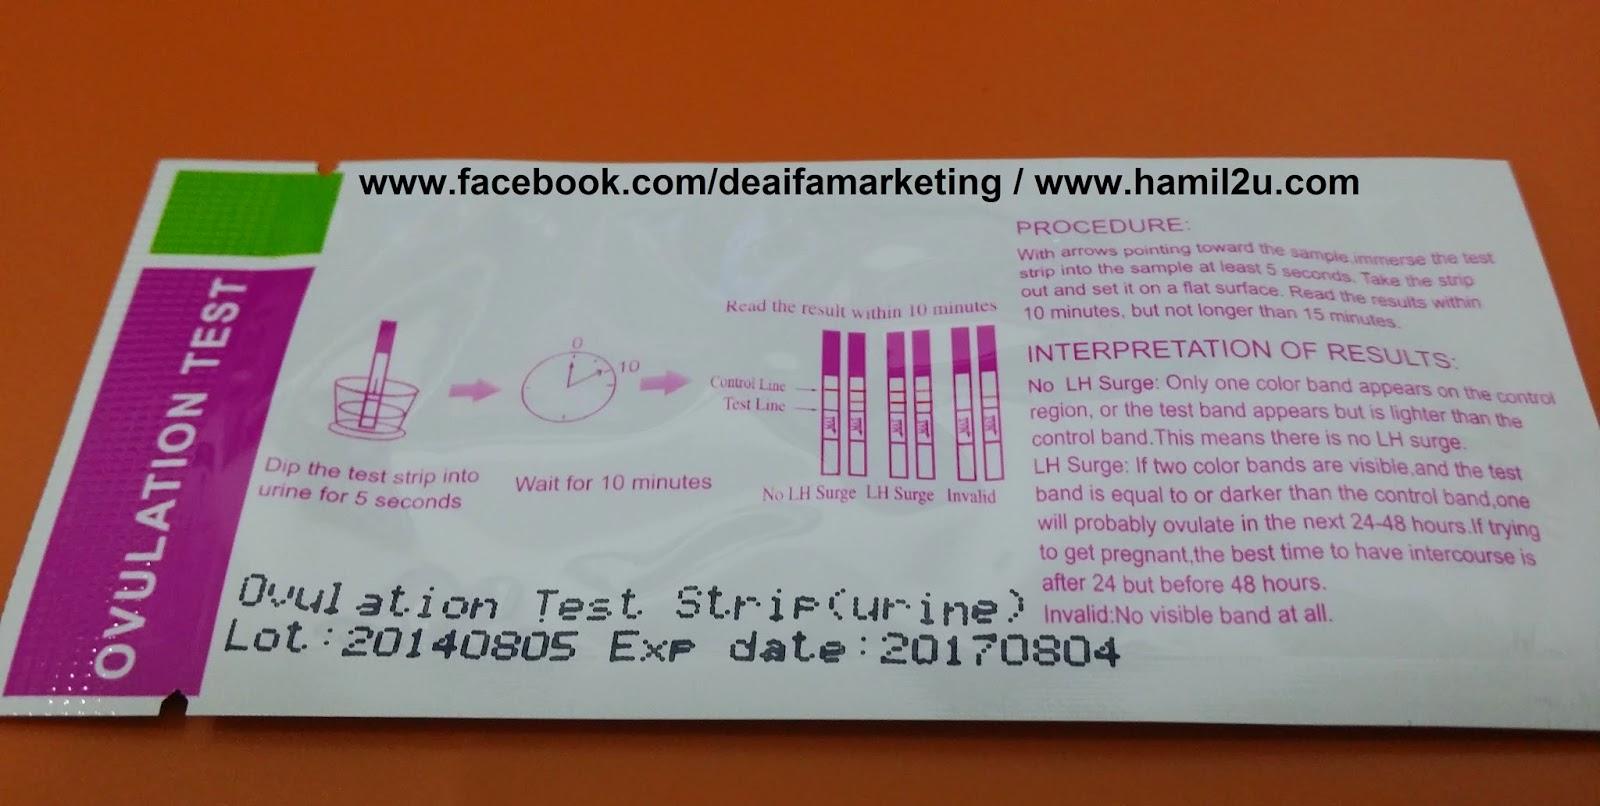 ovulation test kit murah, opk, pregnancy test murah, ovulation predictor kit, cheapest, rm1, borong,deaifa marketing, ovulation test, hamil2u.com, opk deaifa, upt deaifa, 60sen